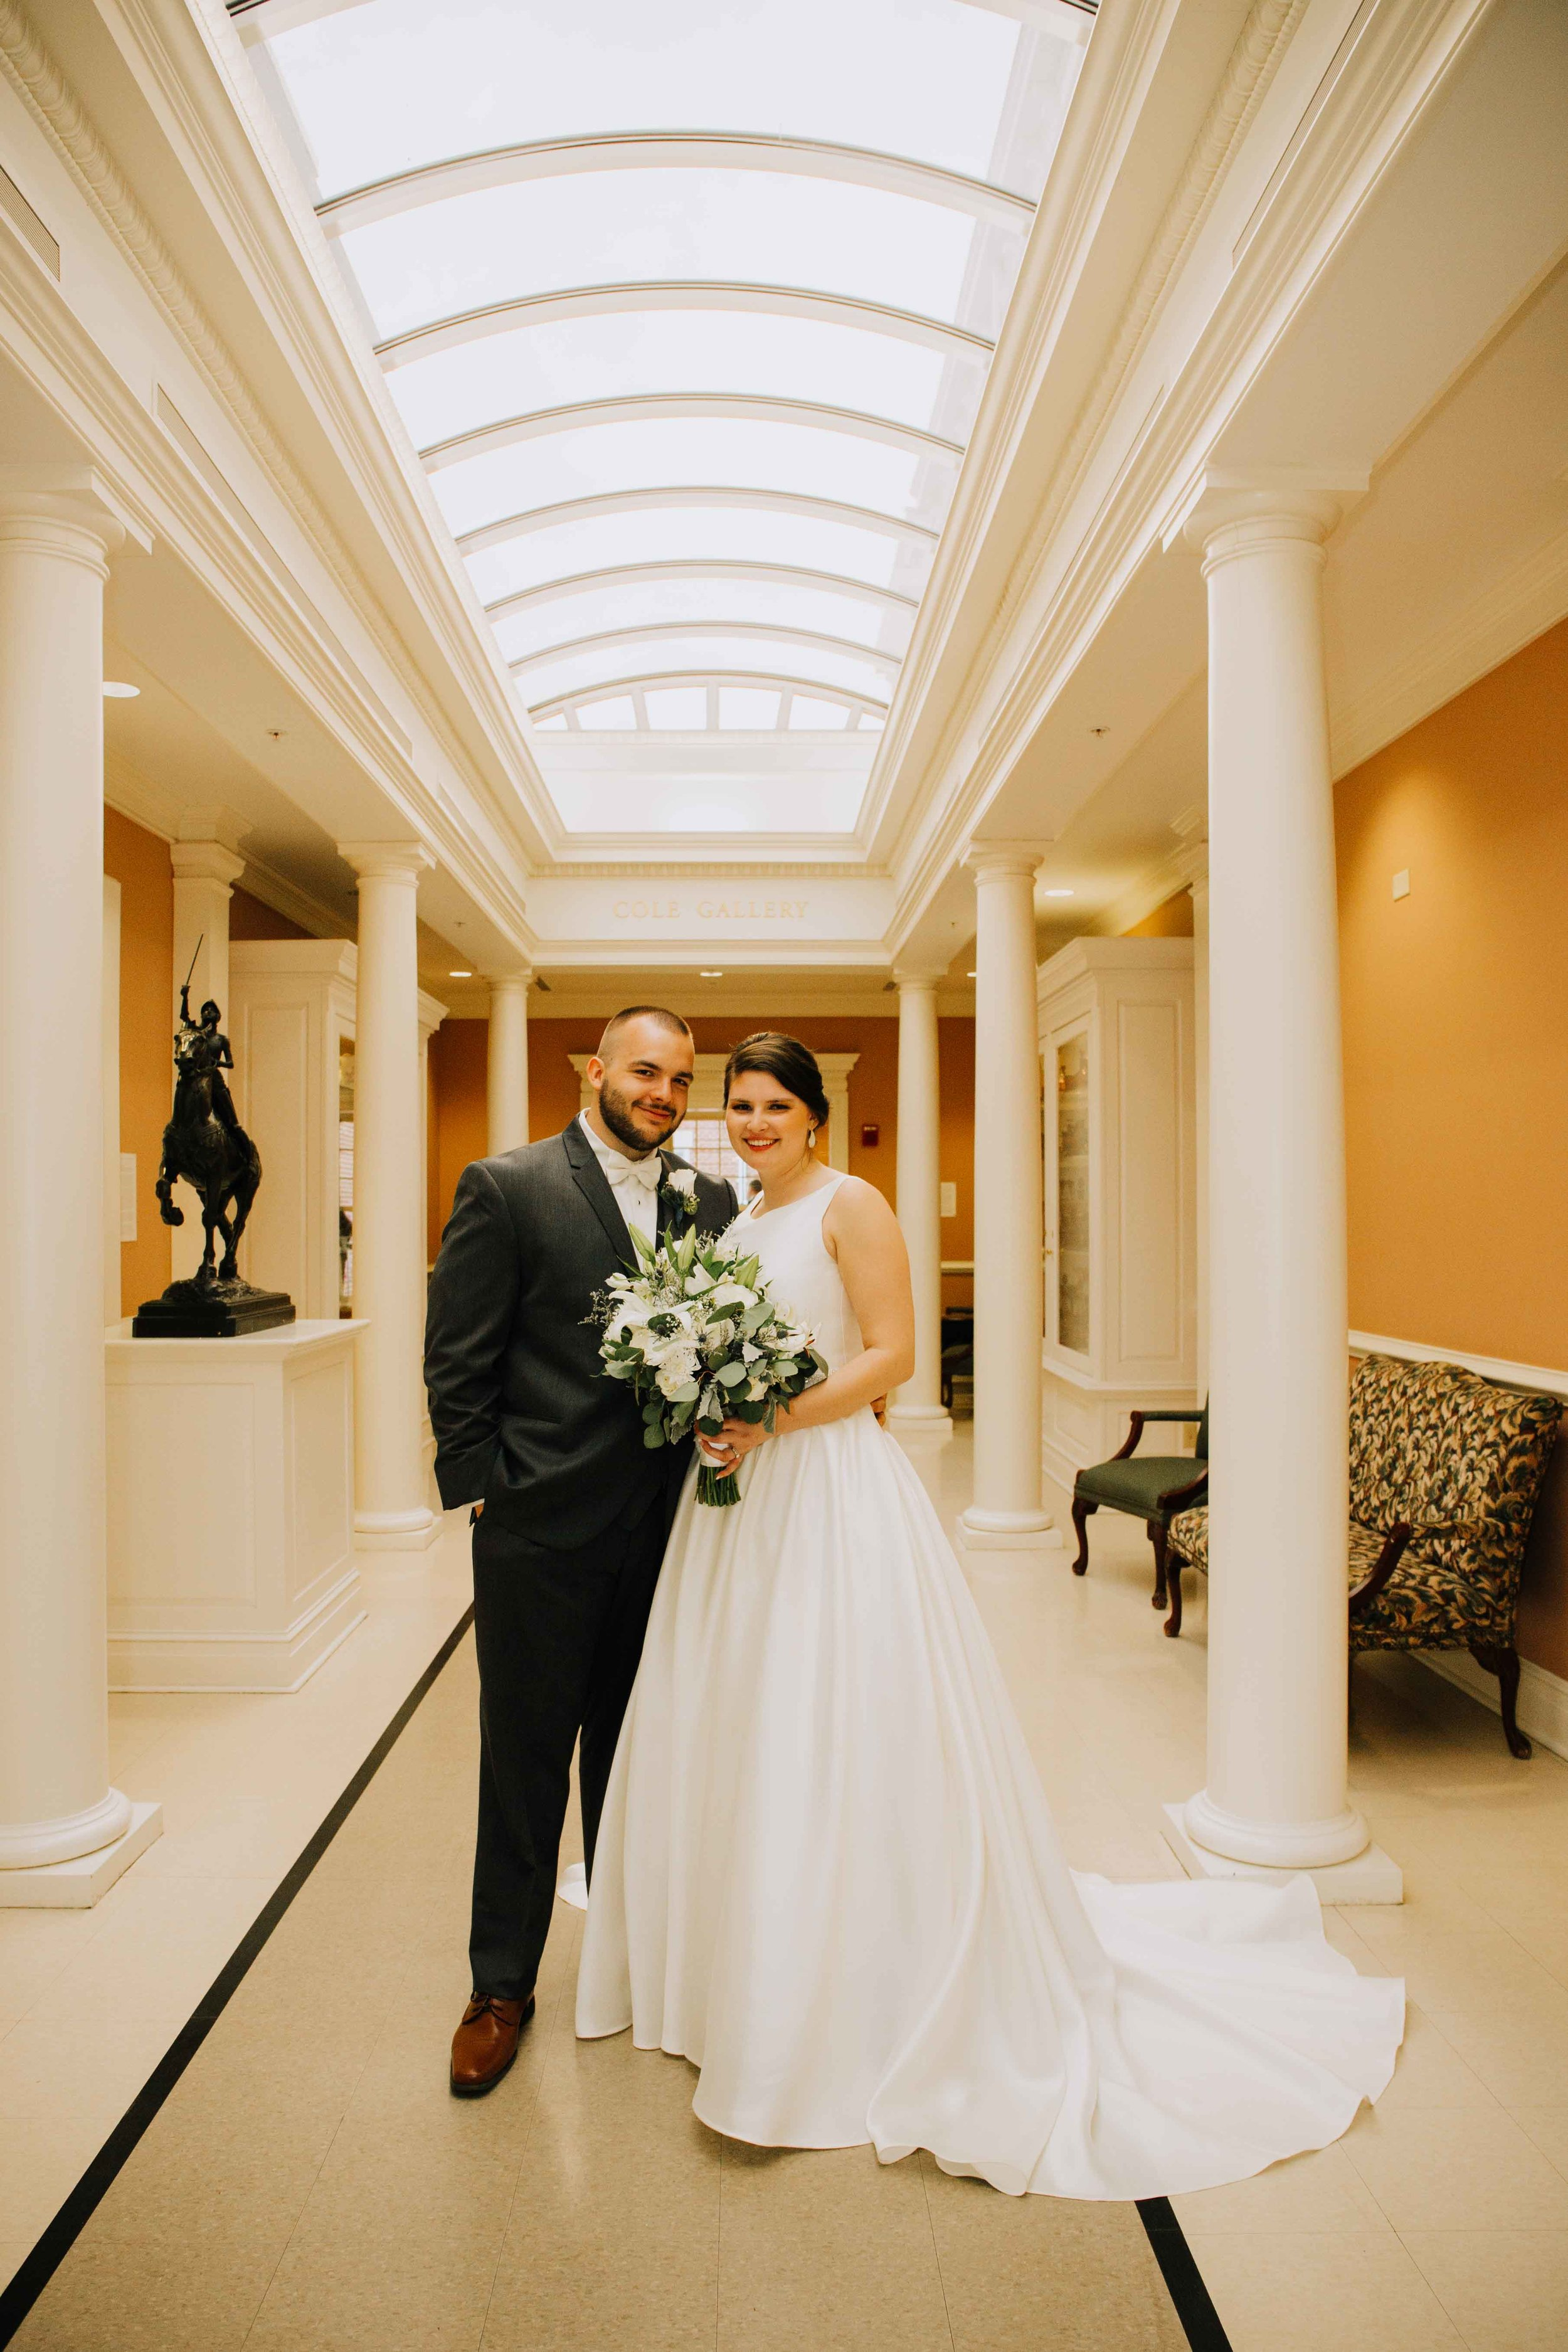 Farmville-Virginia-Wedding-Hotel-Weynoke-Downtown-Jacqueline-Waters-Photography-Detailed- (1102).jpg